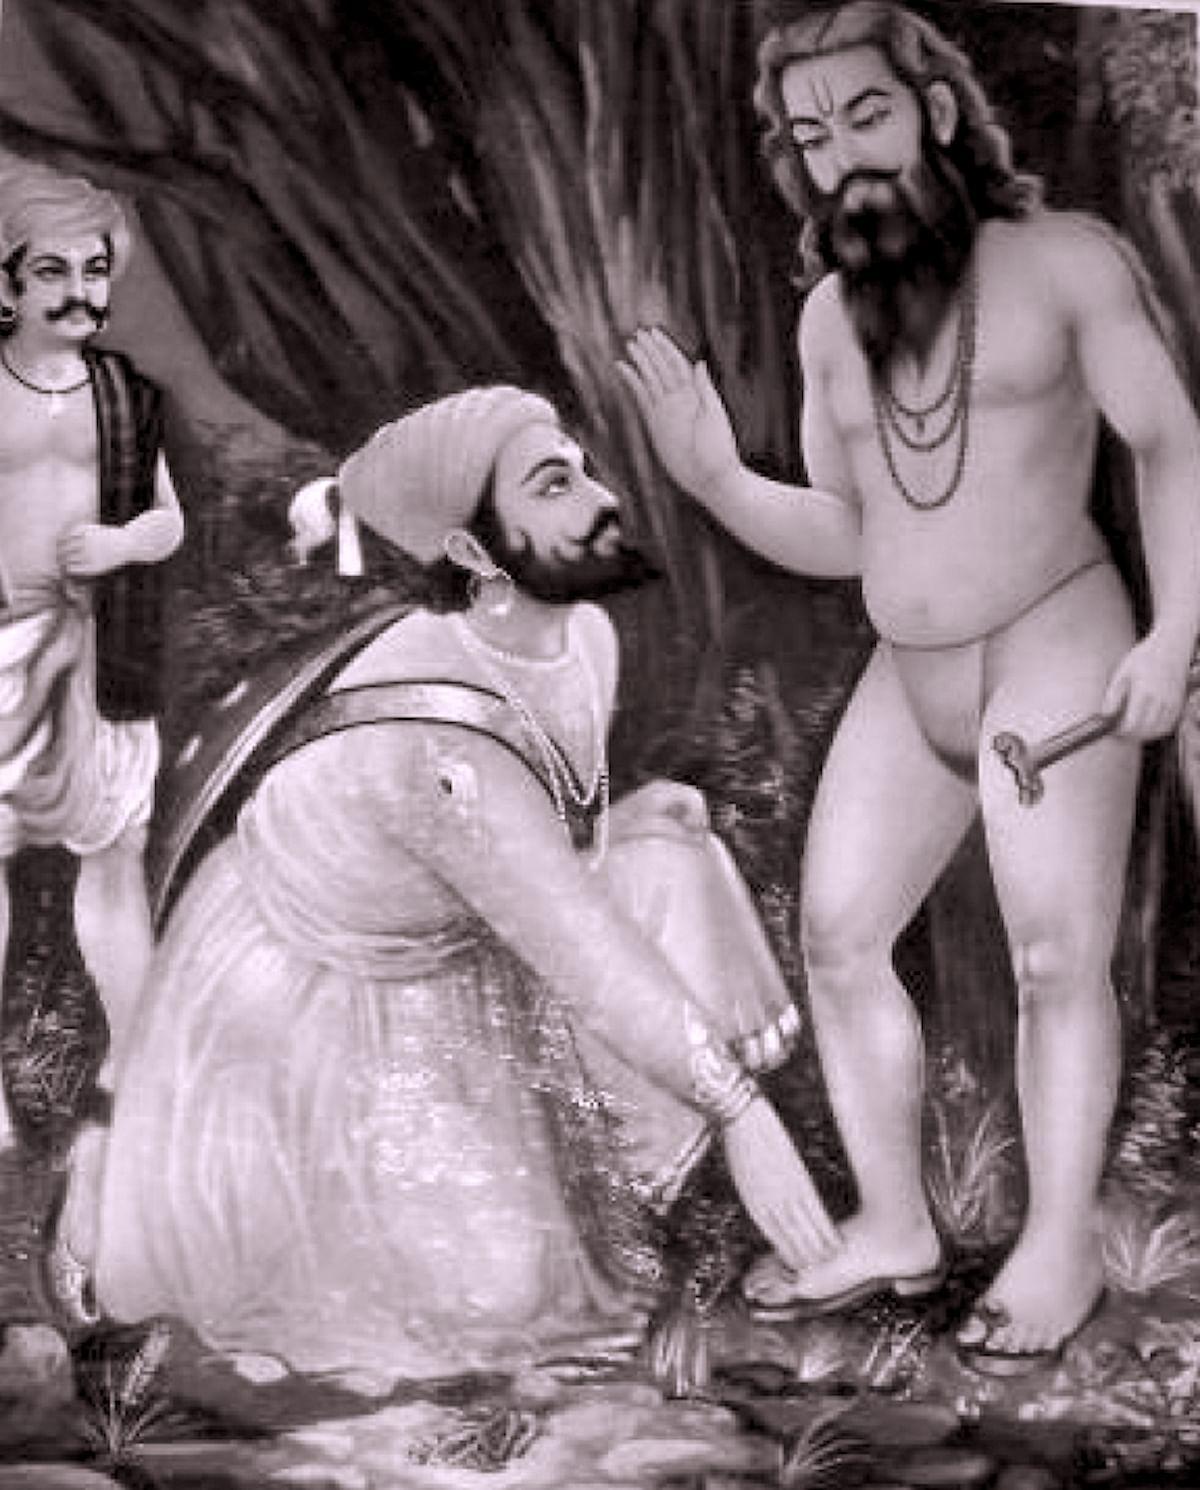 Shivaji and Swami Ramdas